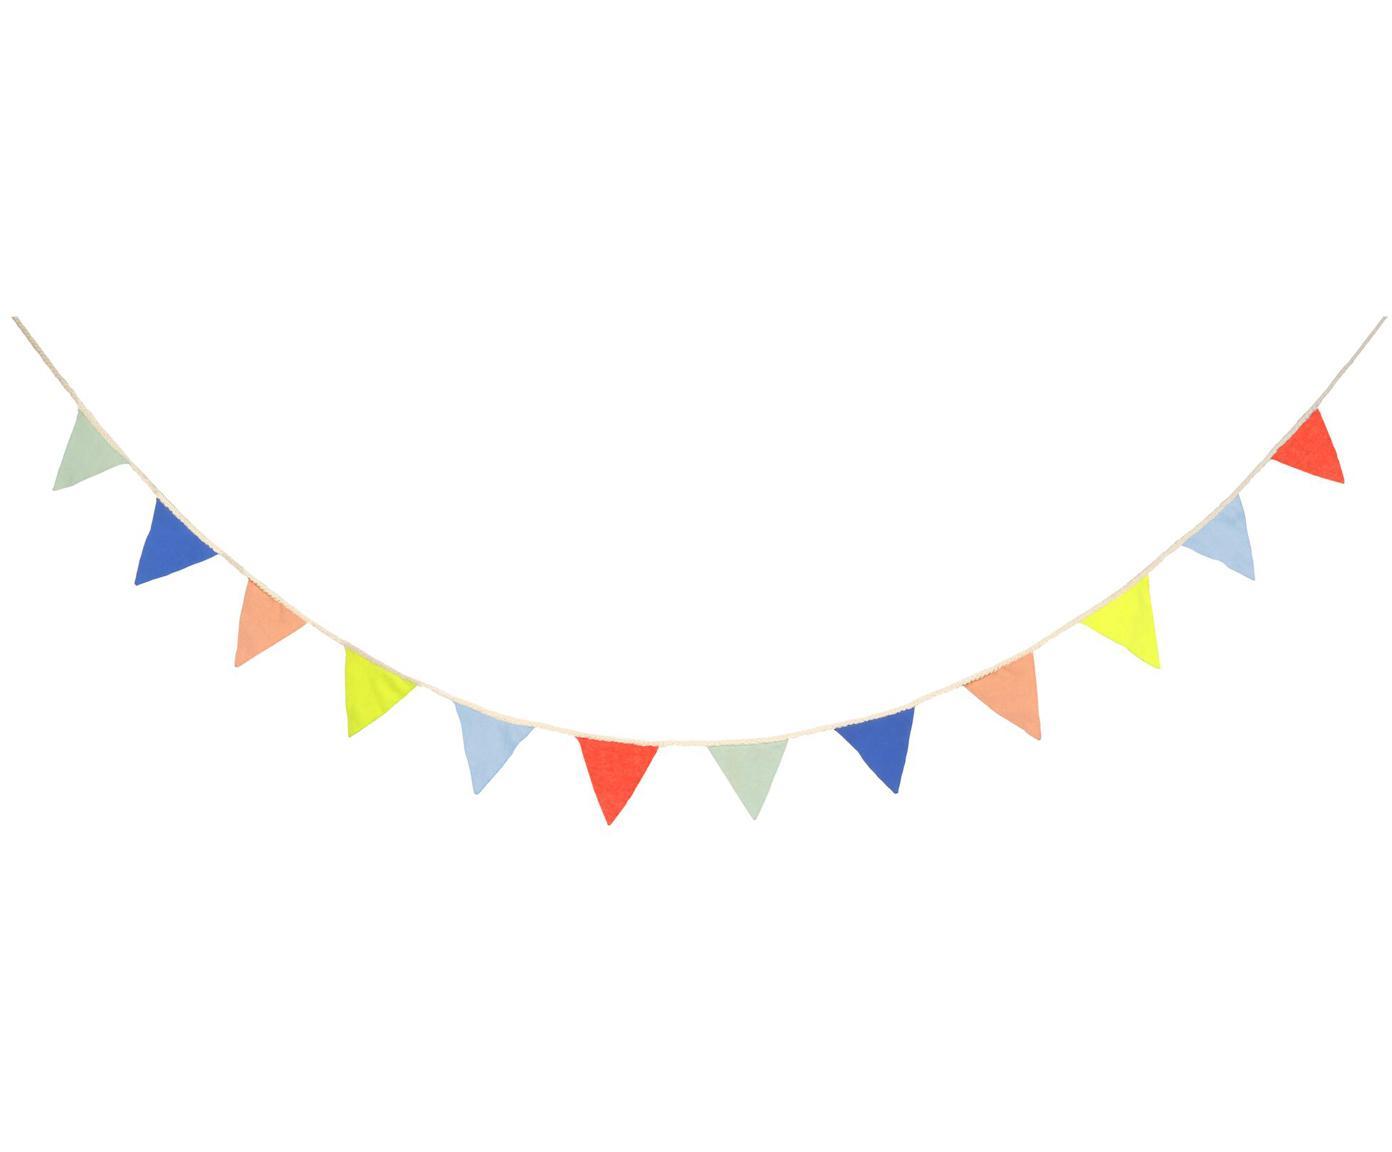 Girlande Flag aus Bio-Baumwolle, 300 cm, Bio-Baumwolle, Mehrfarbig, L 300 cm